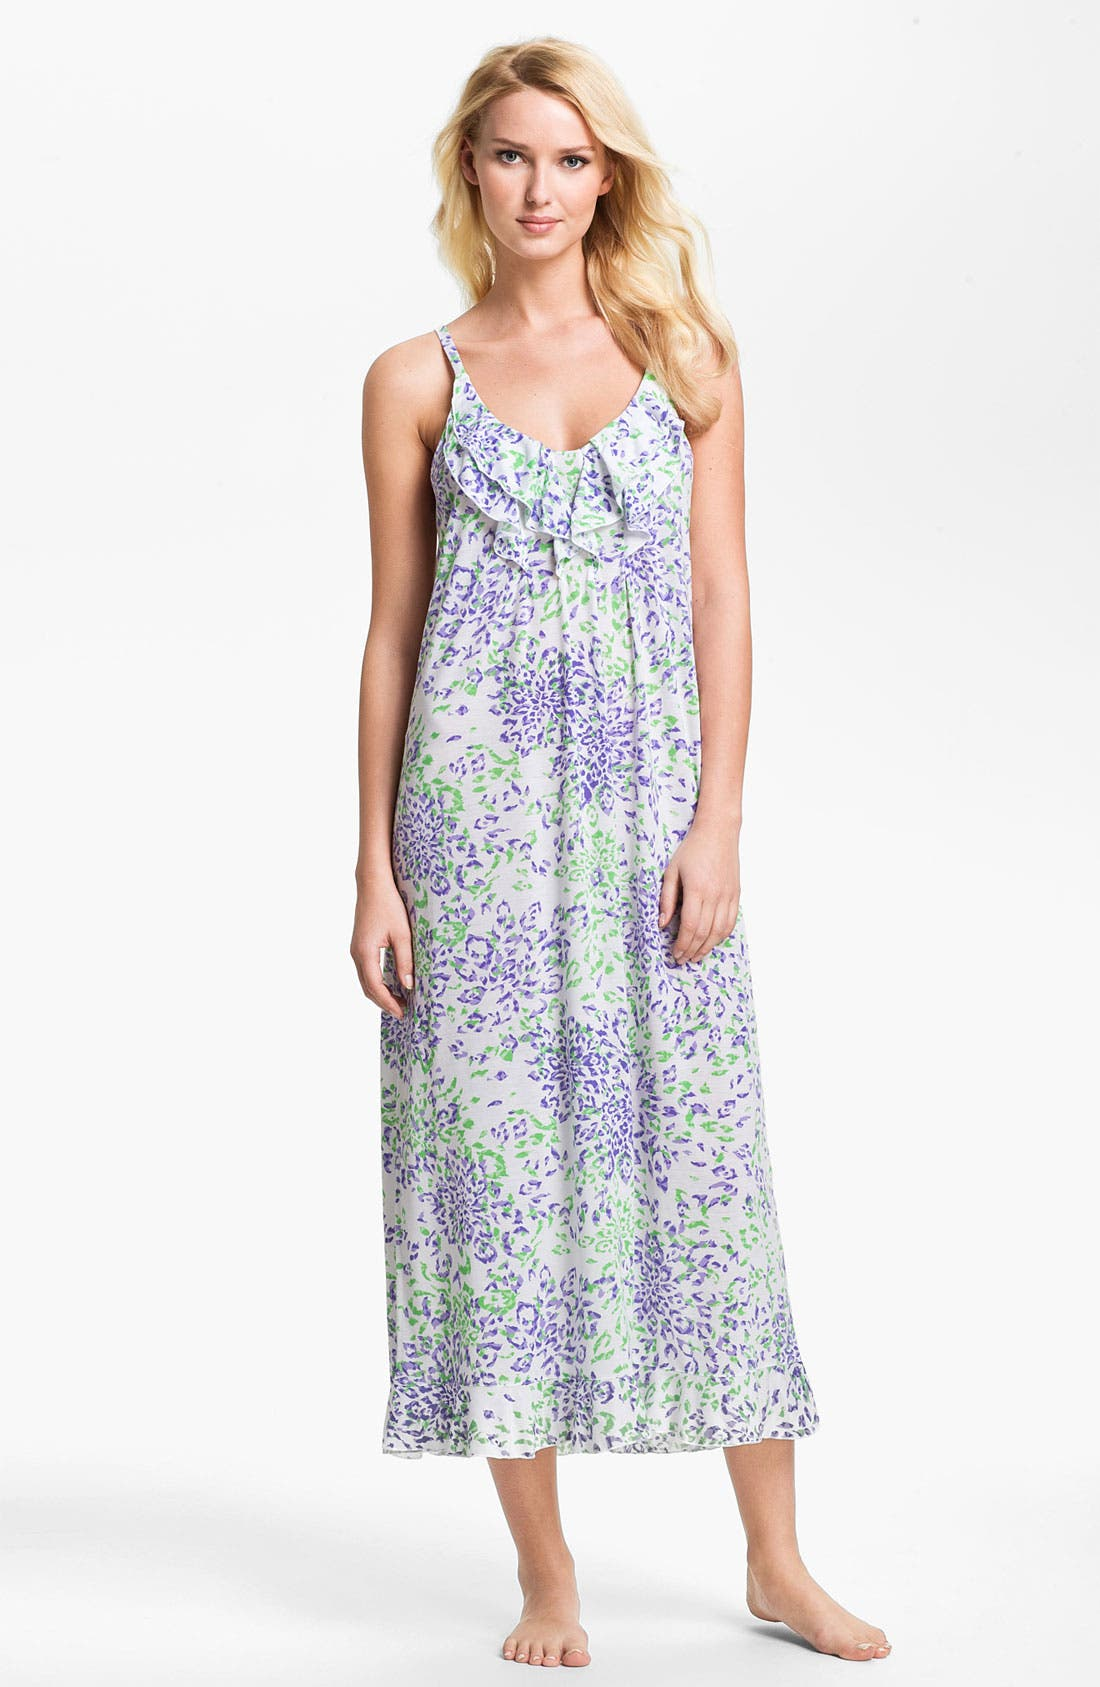 Alternate Image 1 Selected - Oscar de la Renta Sleepwear 'Animal Blossom' Nightgown